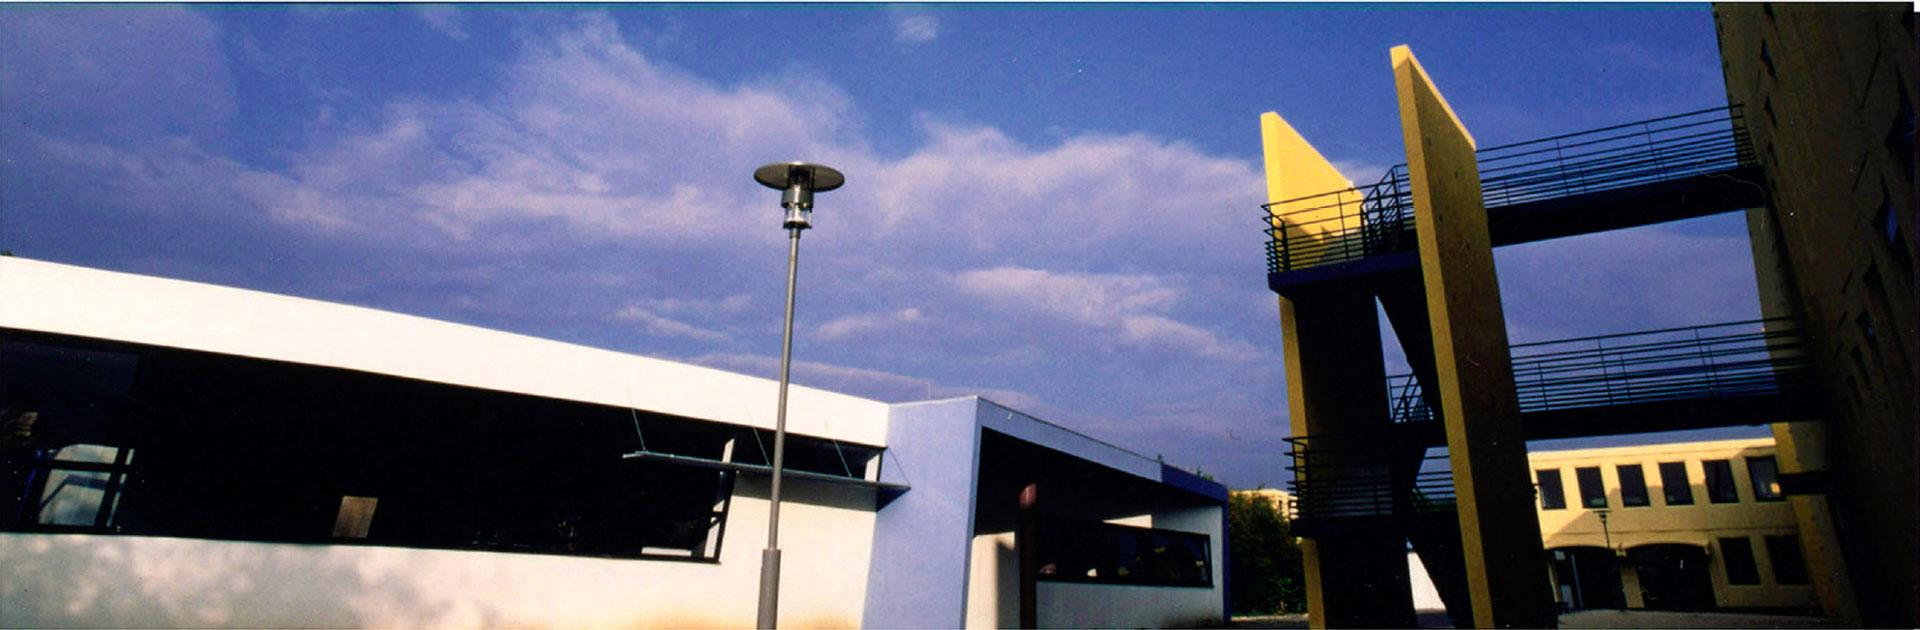 LEP FERDINAND REVOUL VALREAS RESTRUCTURATION ET EXTENSION 1995-2000